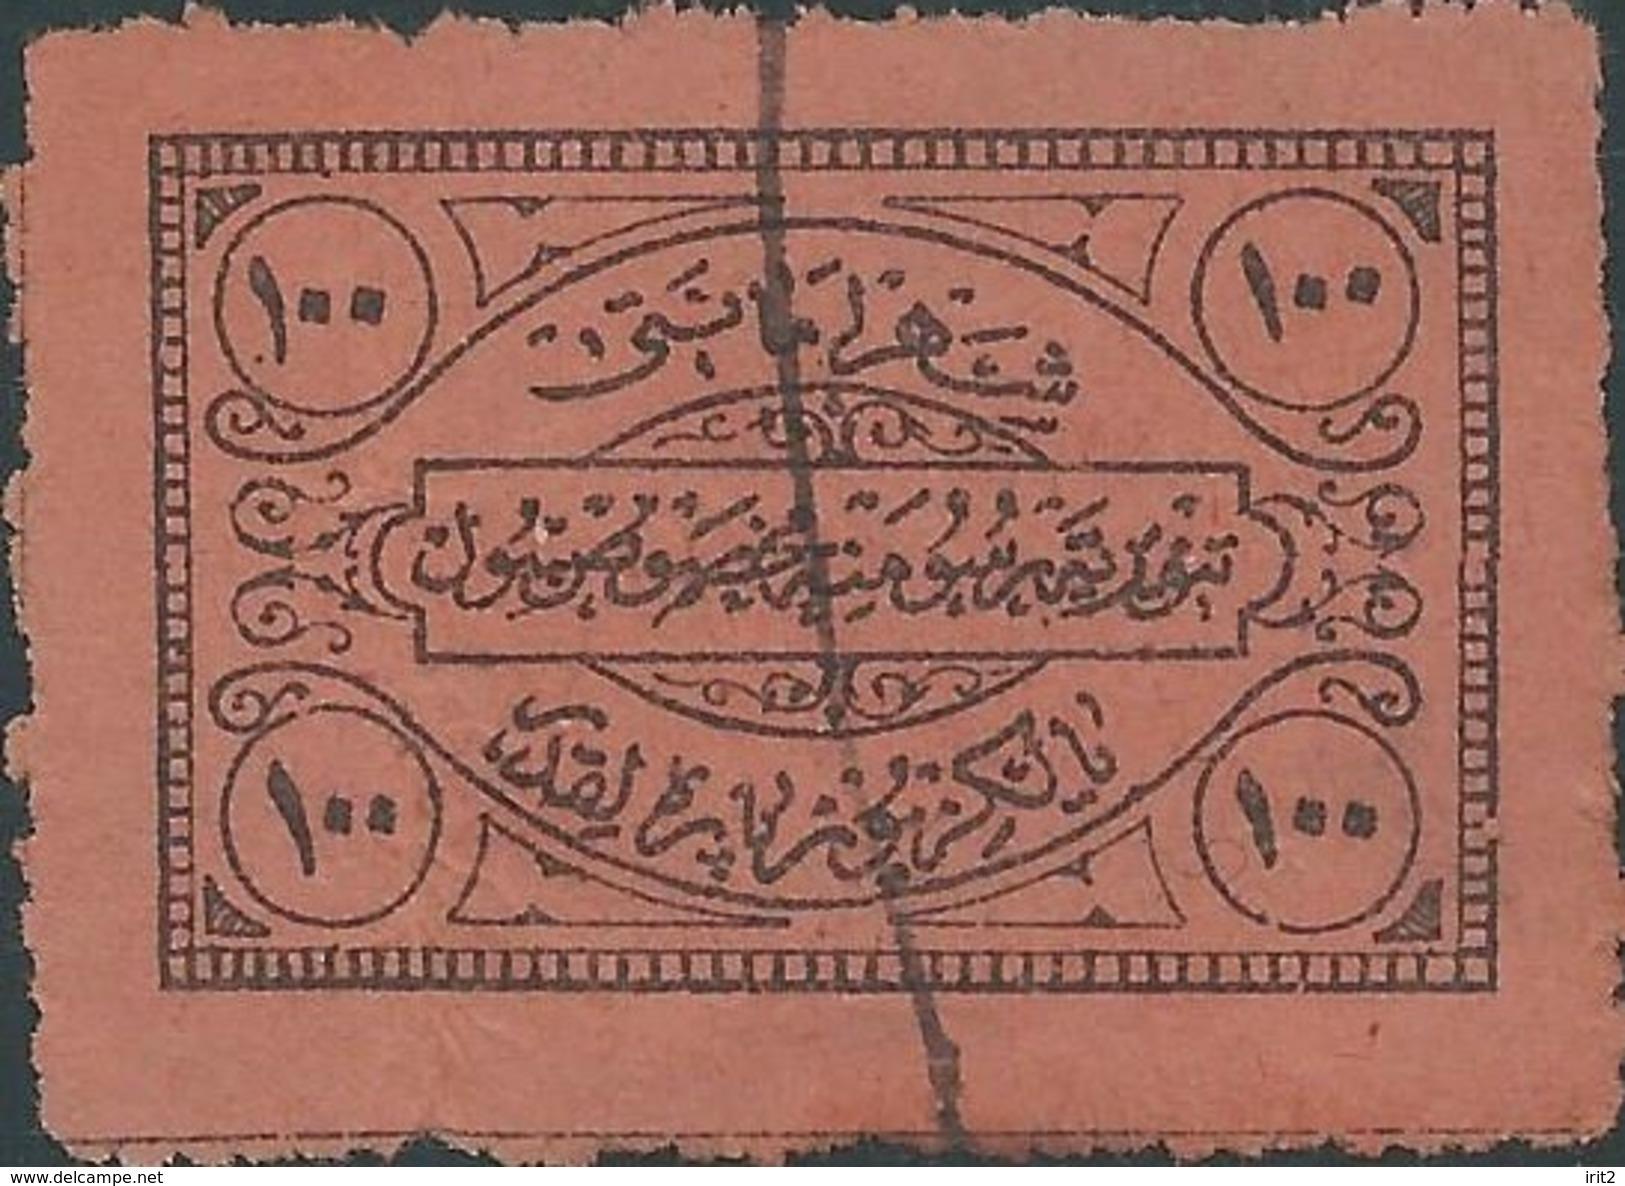 TURCHIA - TURKEY-TURKISH-Impero Ottomano - OTTOMAN-OTTOMANI-OSMANI 1858-1921 Fiscal Revenue Stamp Rar Used - 1858-1921 Osmanisches Reich